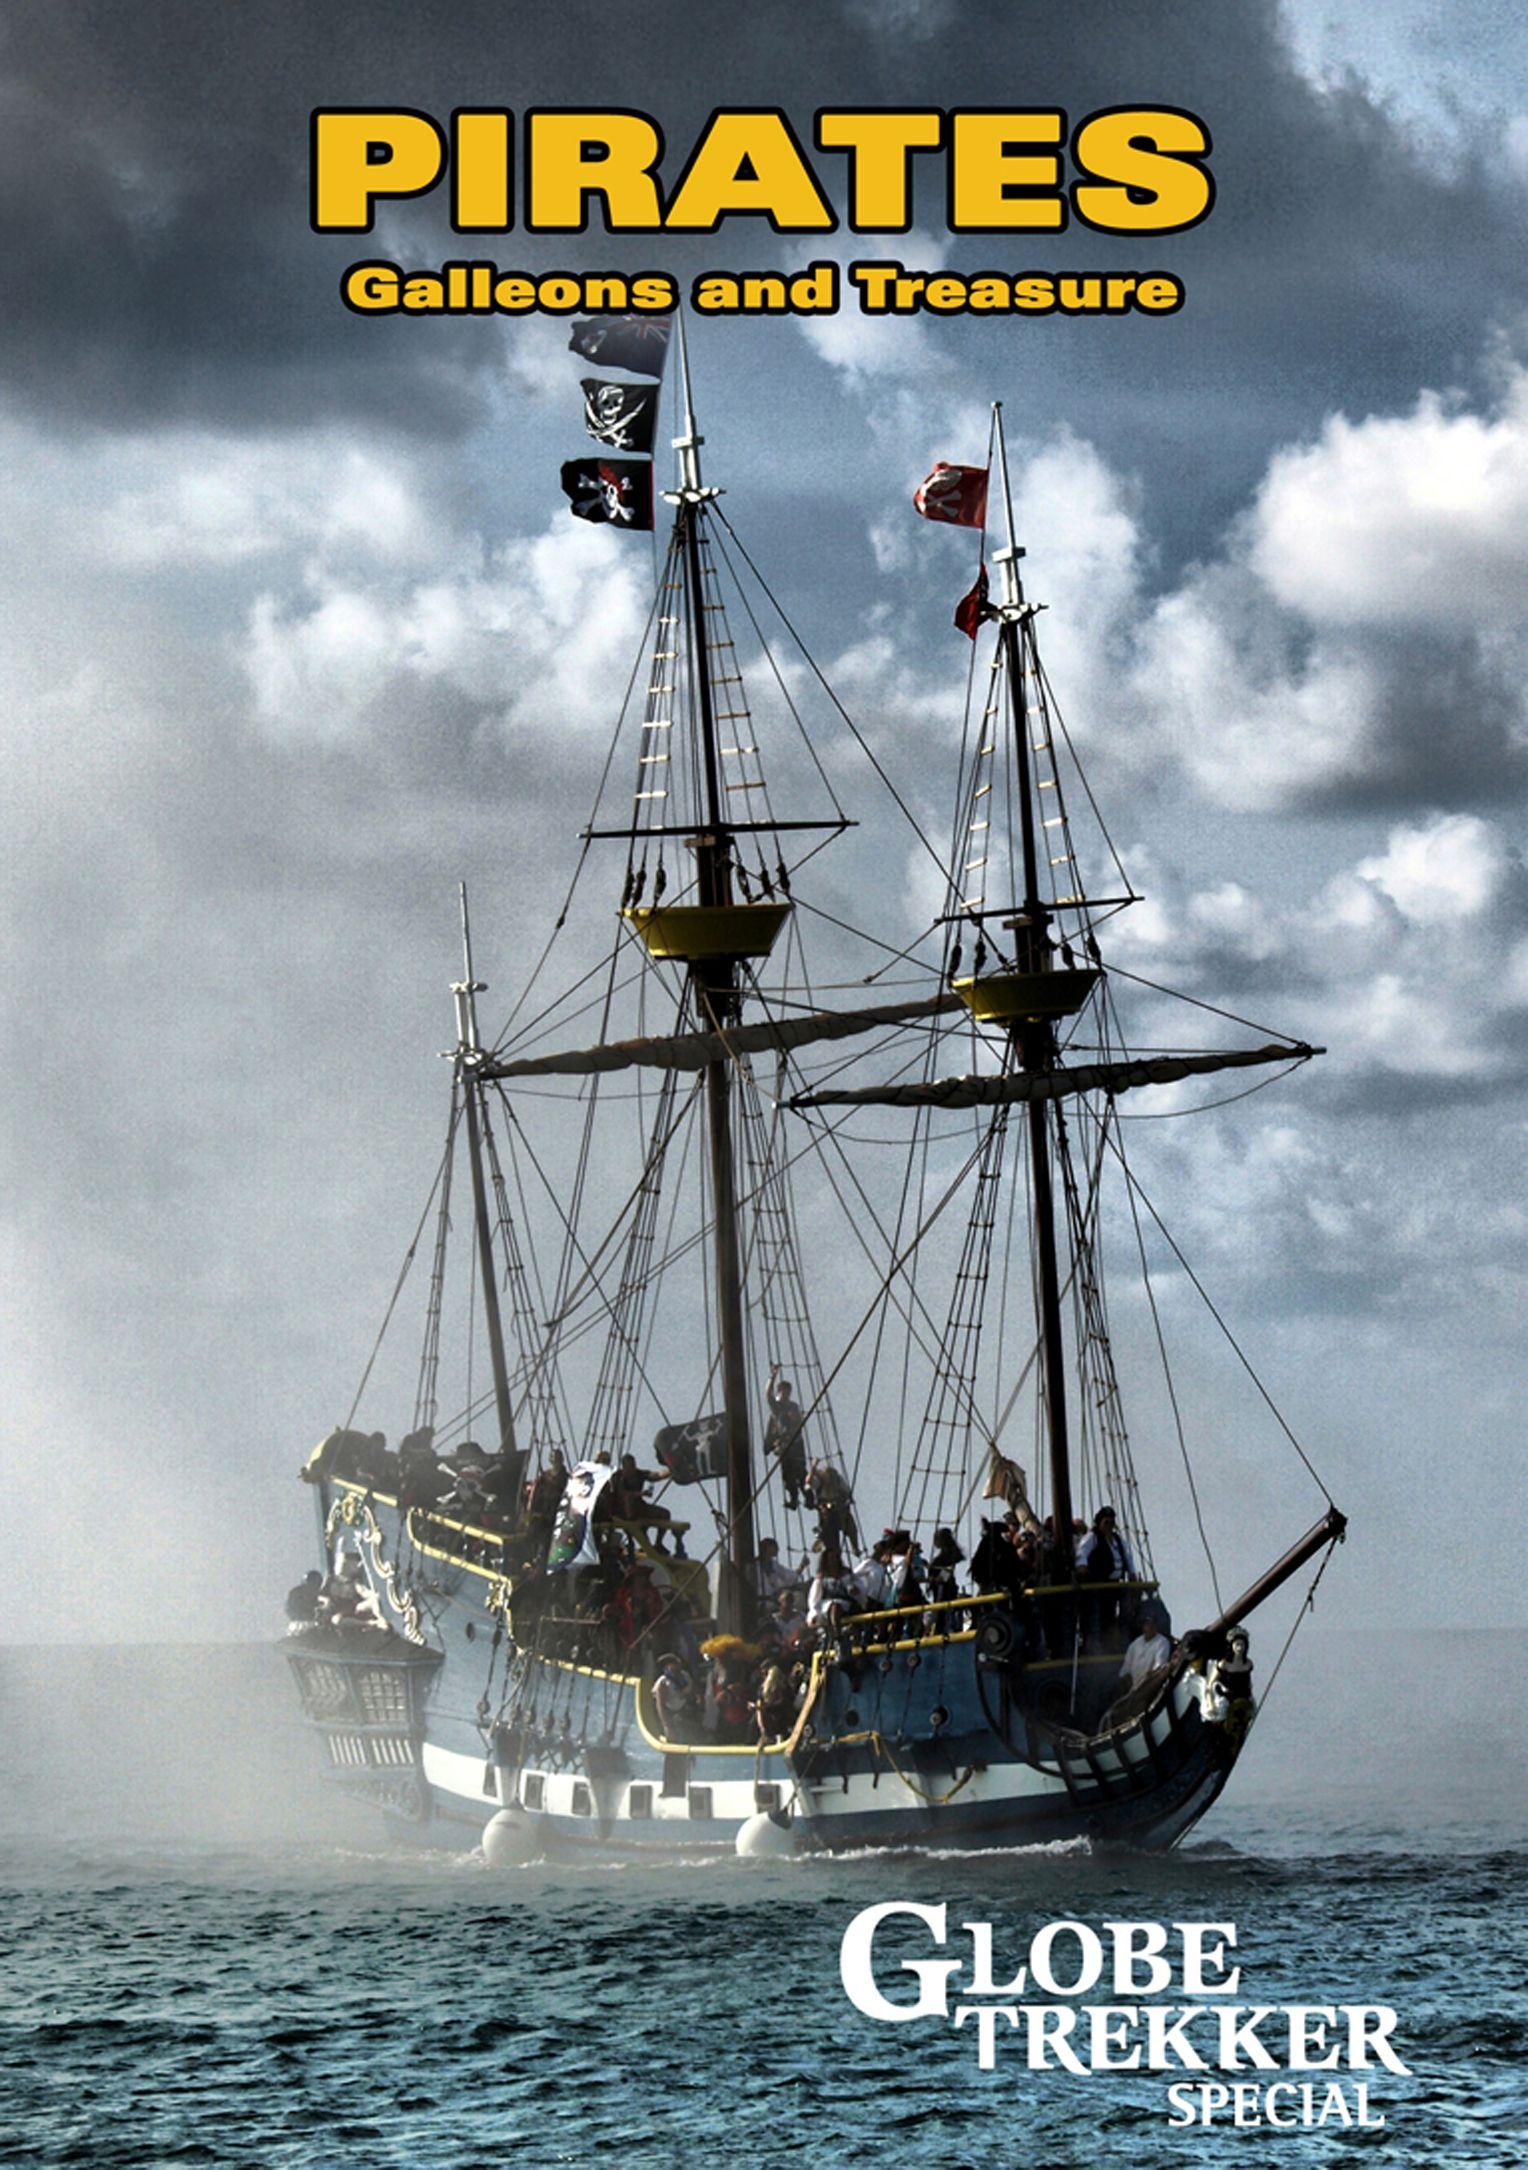 Globe Trekker: Galleons, Pirates and Treasures